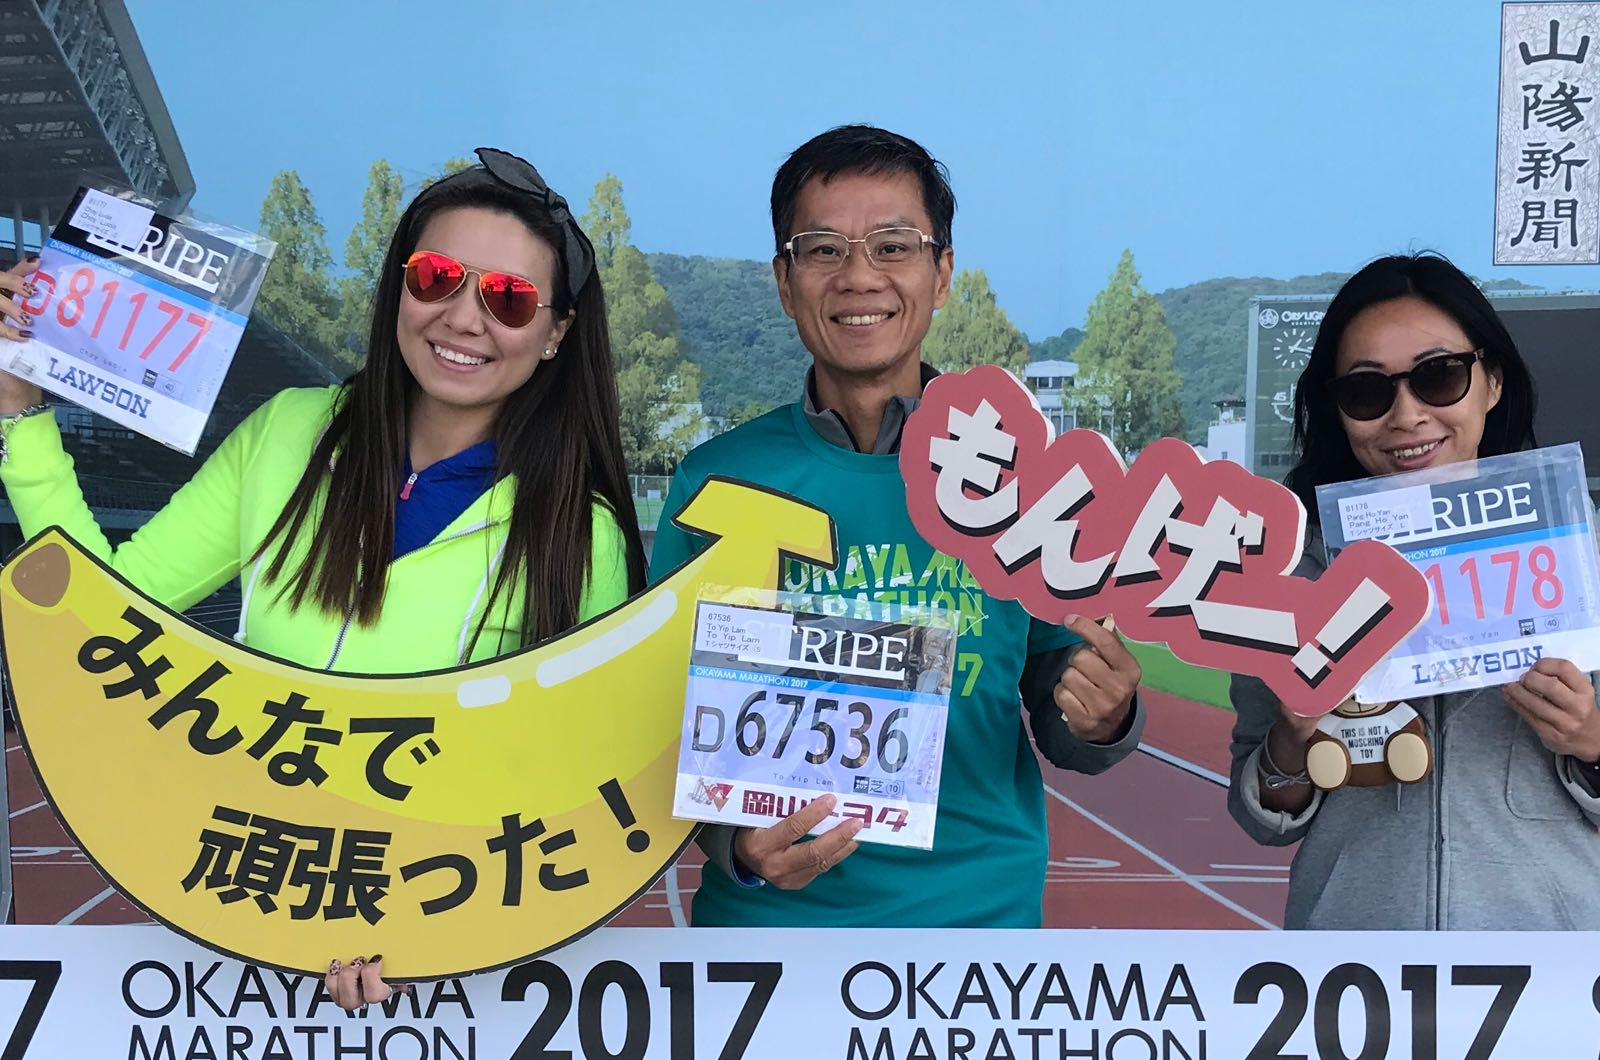 2017-11-16-PHOTO-00000687.jpg